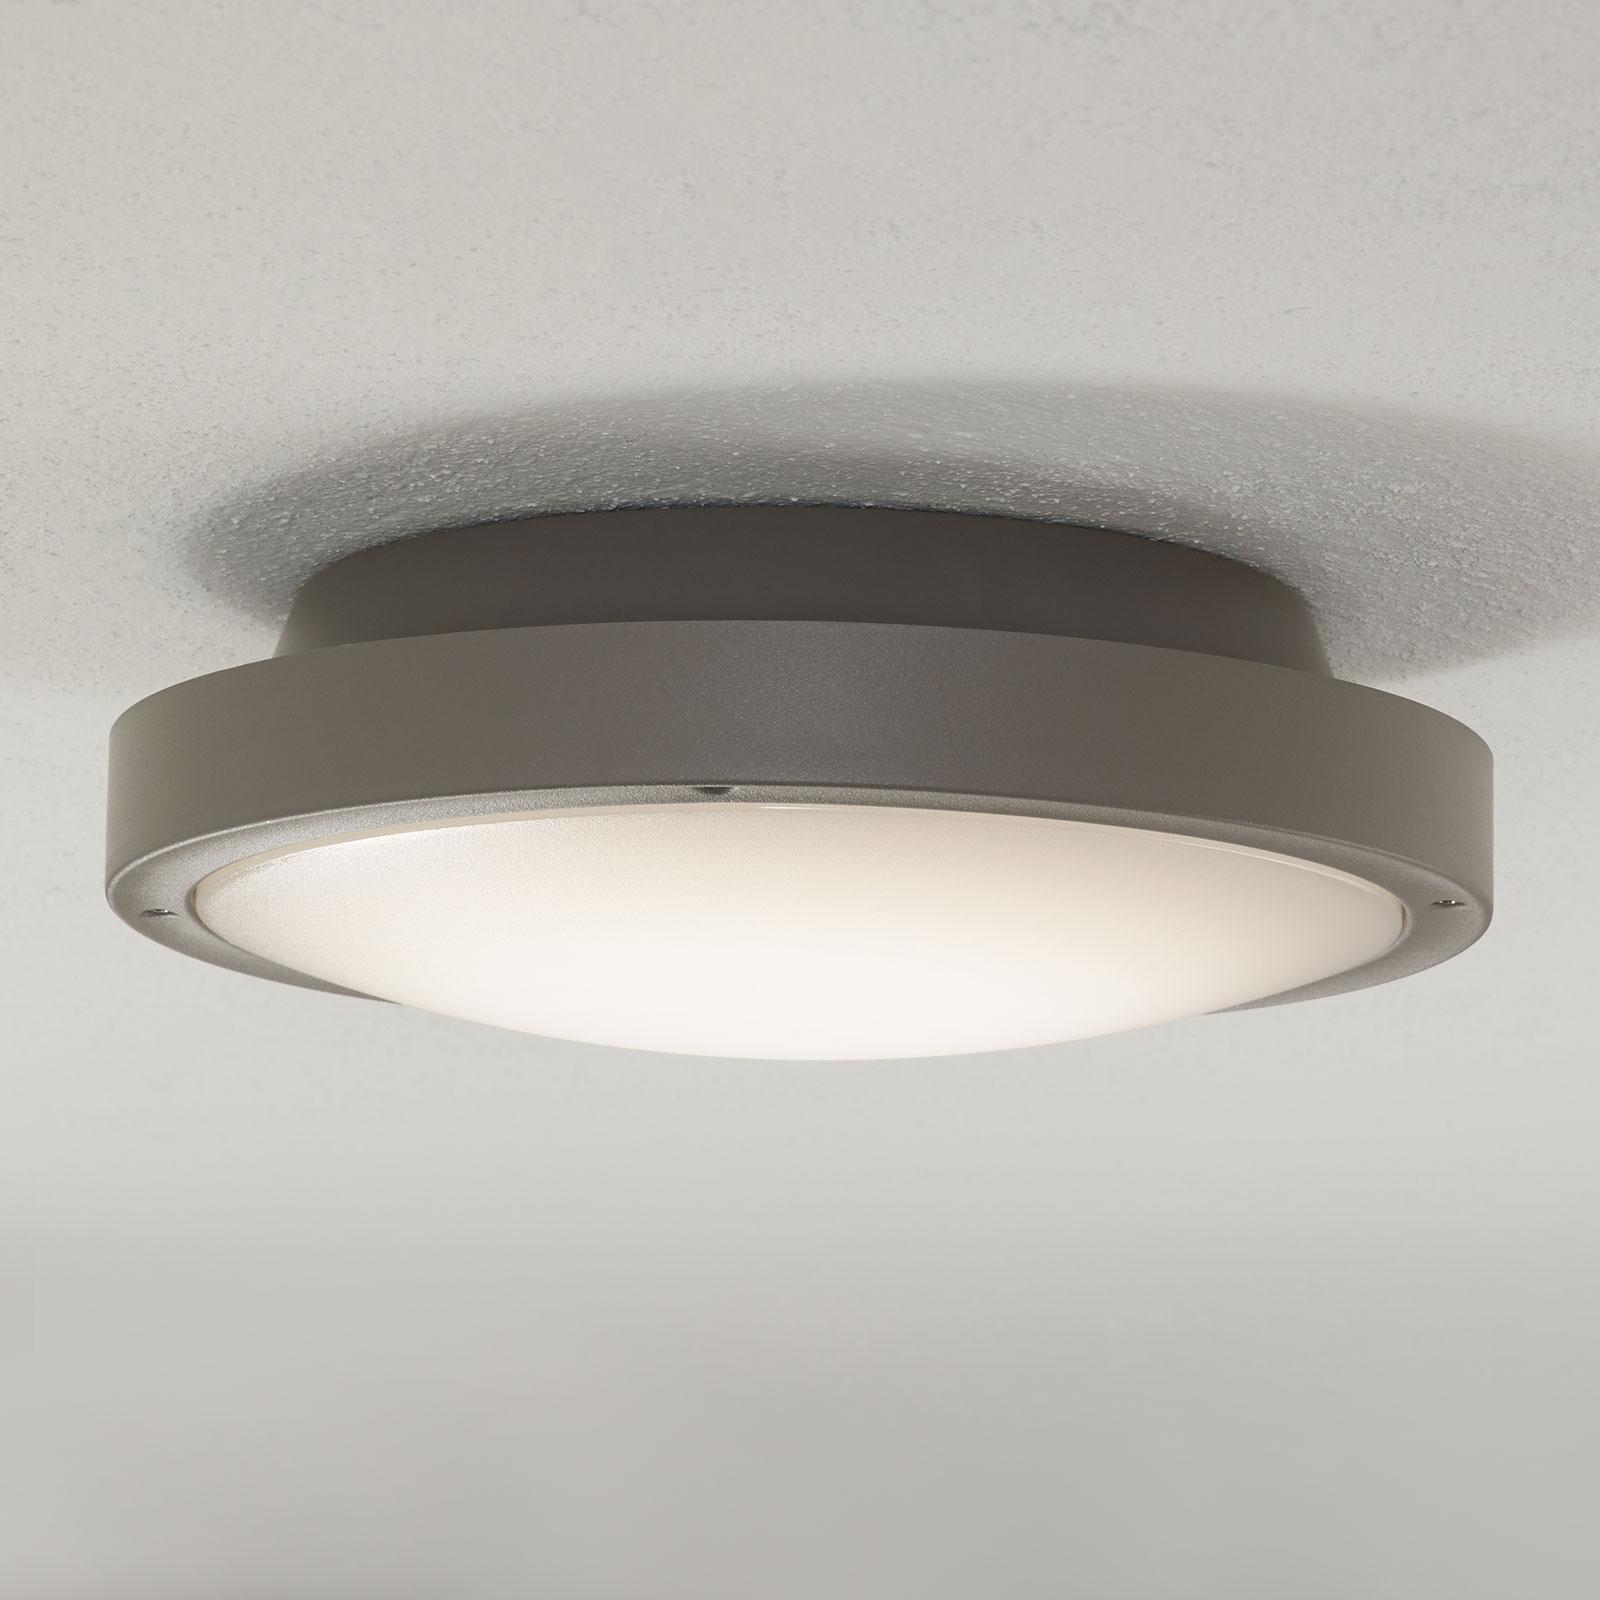 Arcchio Benian lampa sufitowa LED 4000K